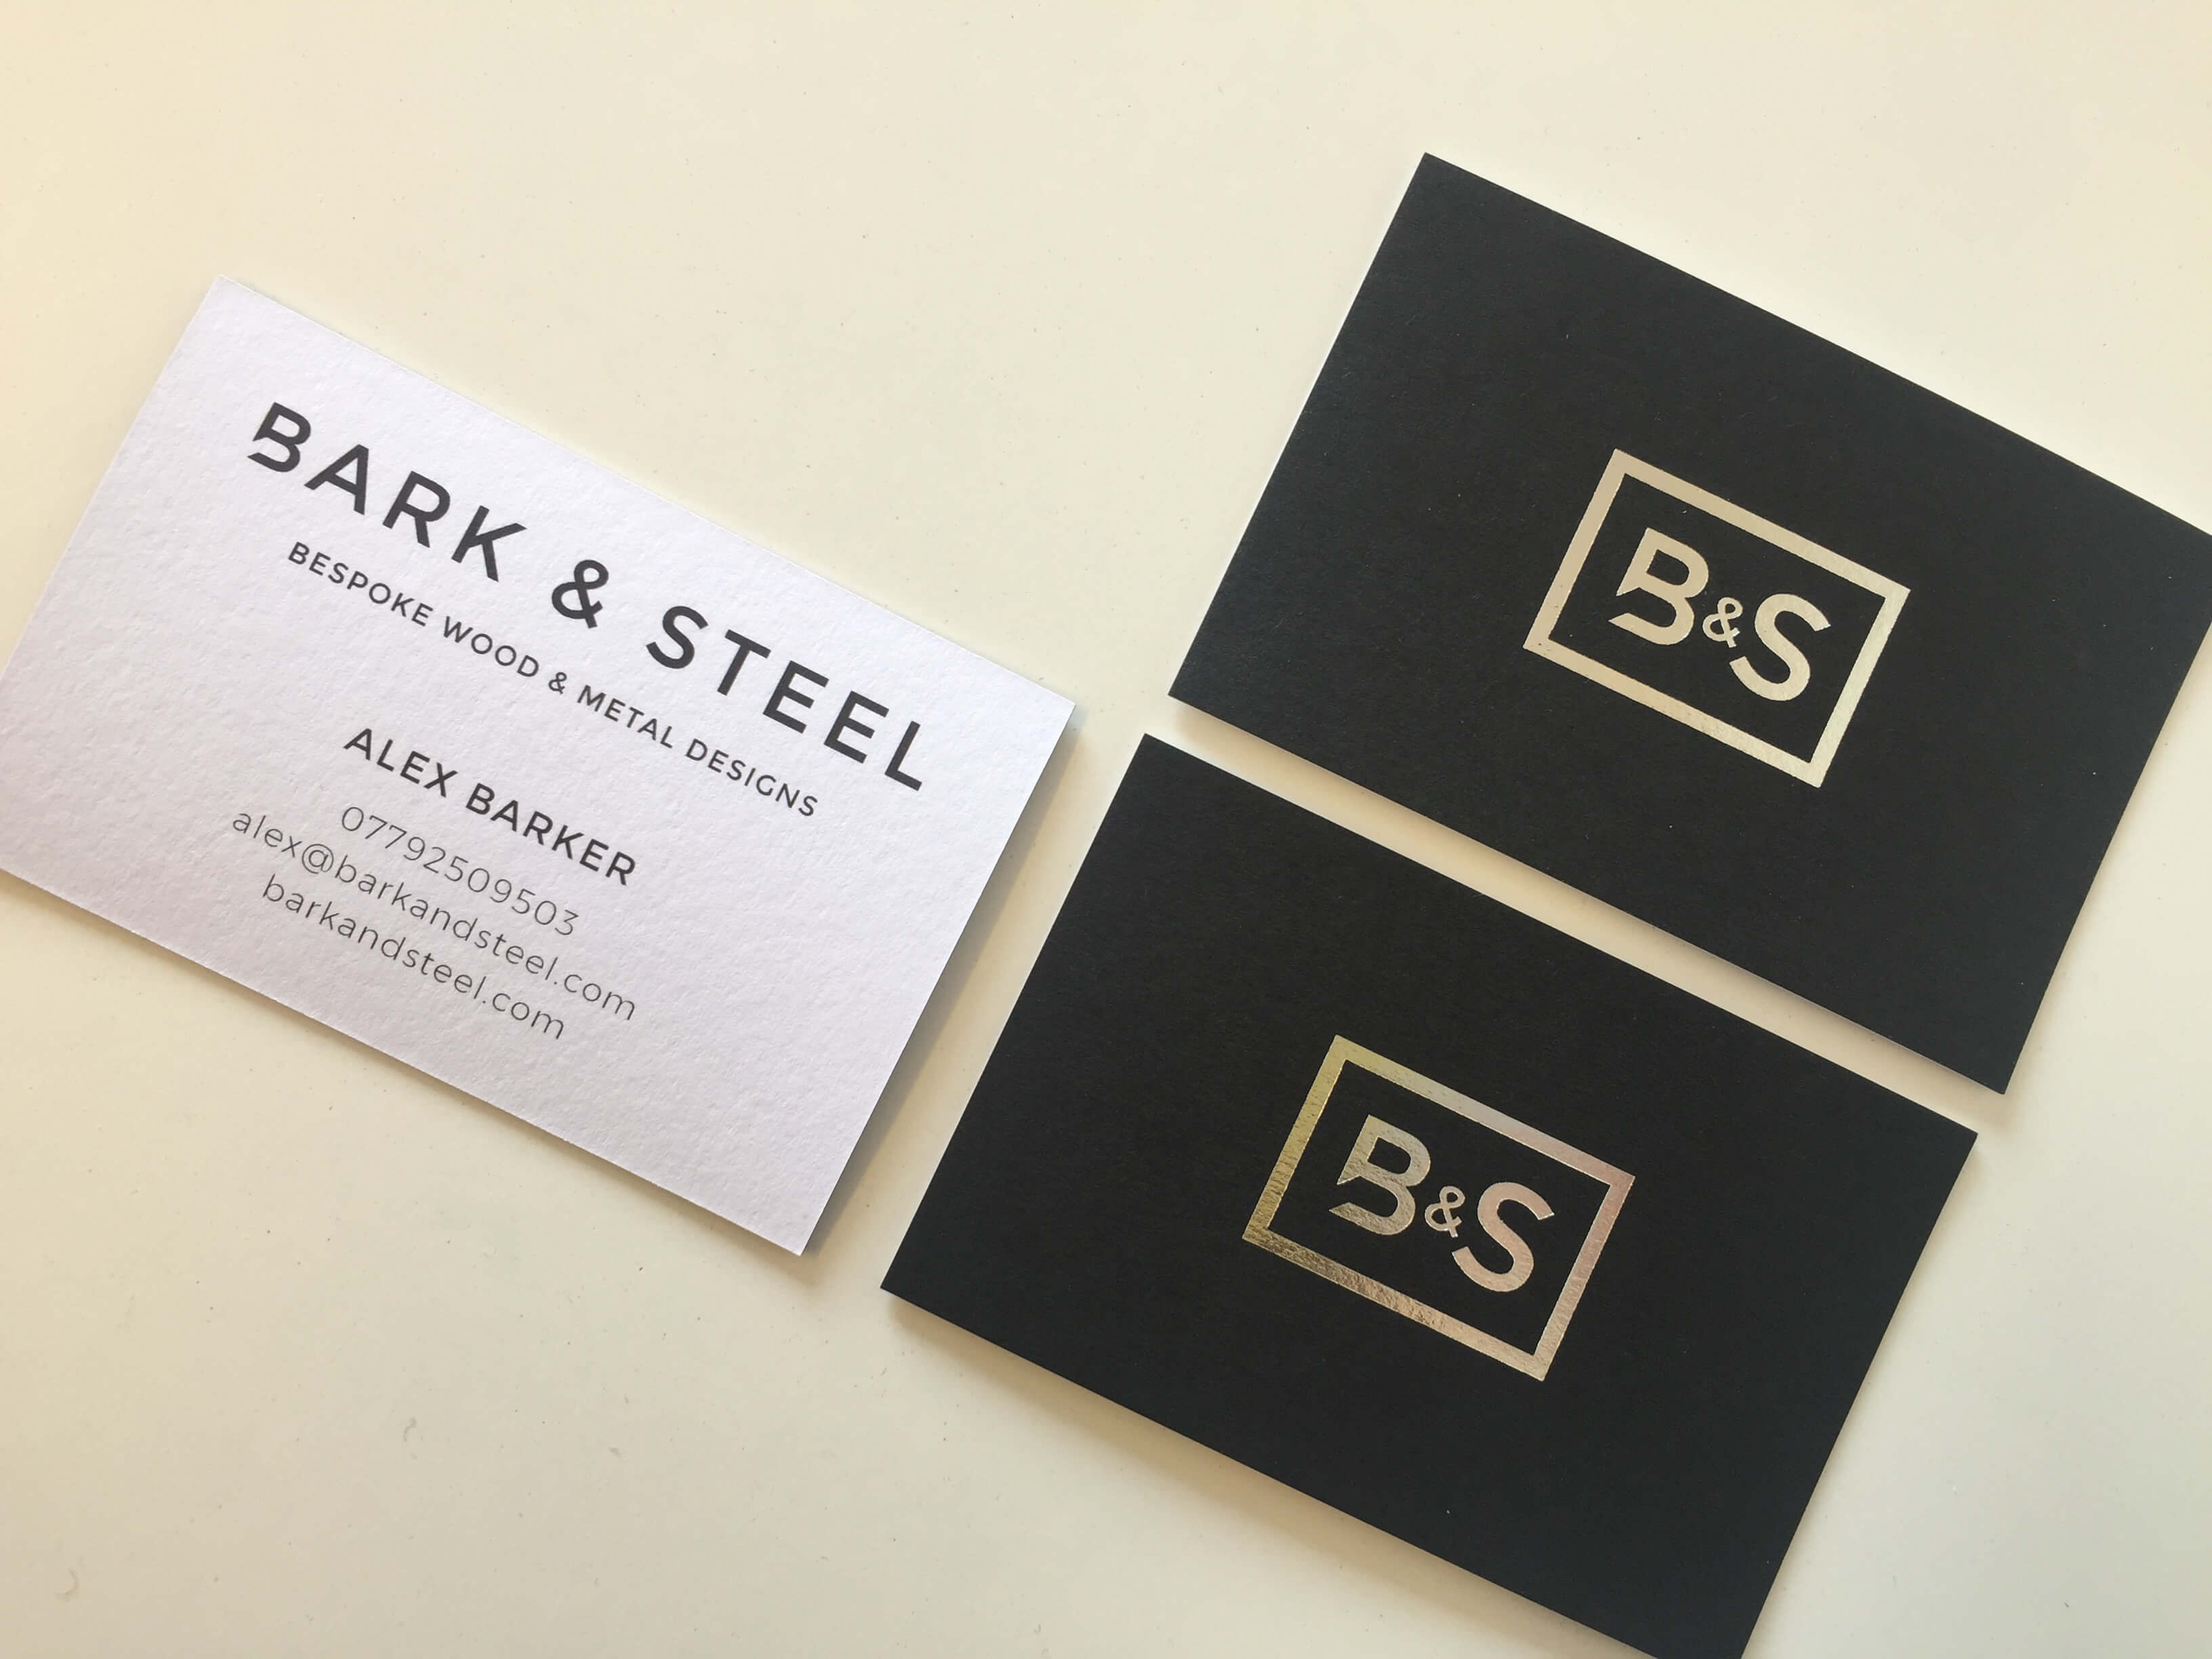 Bark and Steel Logo